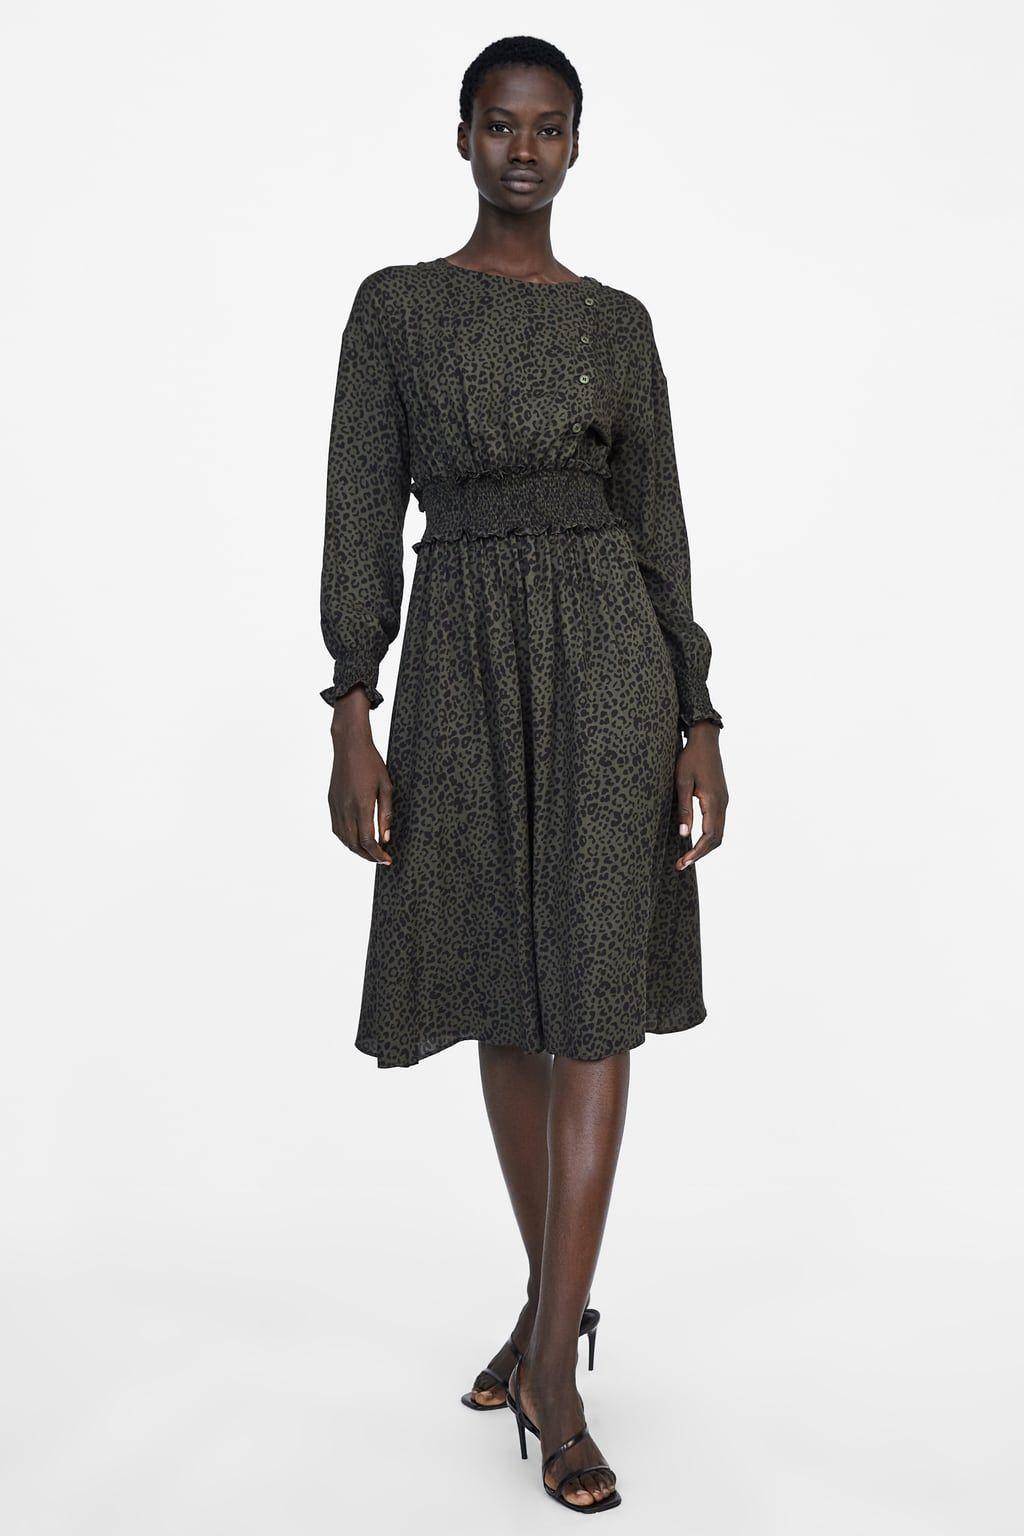 precios baratass mejor lugar diseño profesional VESTIDO ESTAMPADO ANIMAL | Animal print dresses, Dresses ...